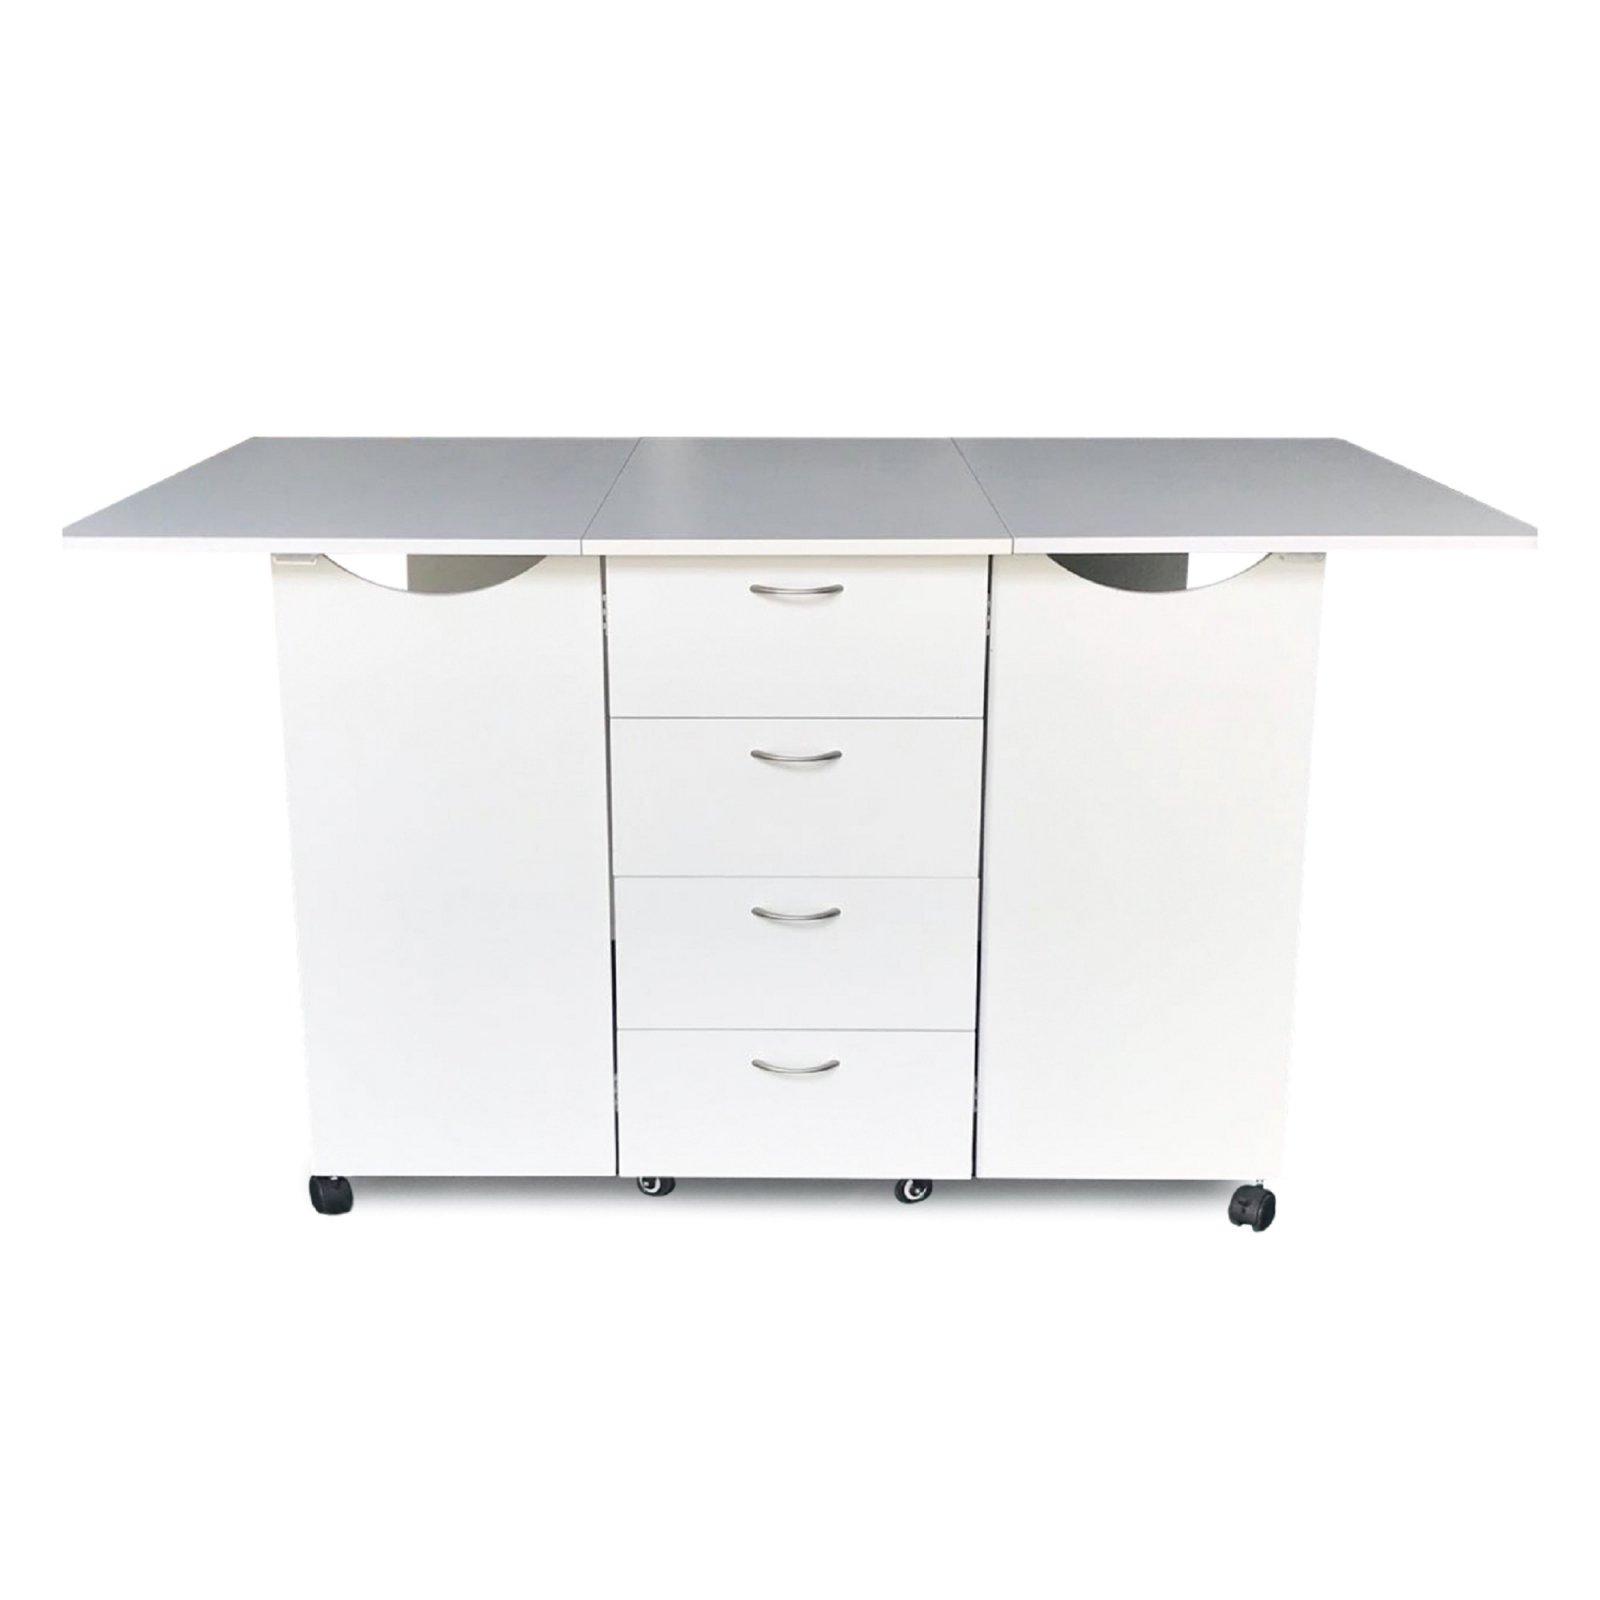 Kookaburra Cutting Table - Ash White - Kangaroo Sewing Furniture